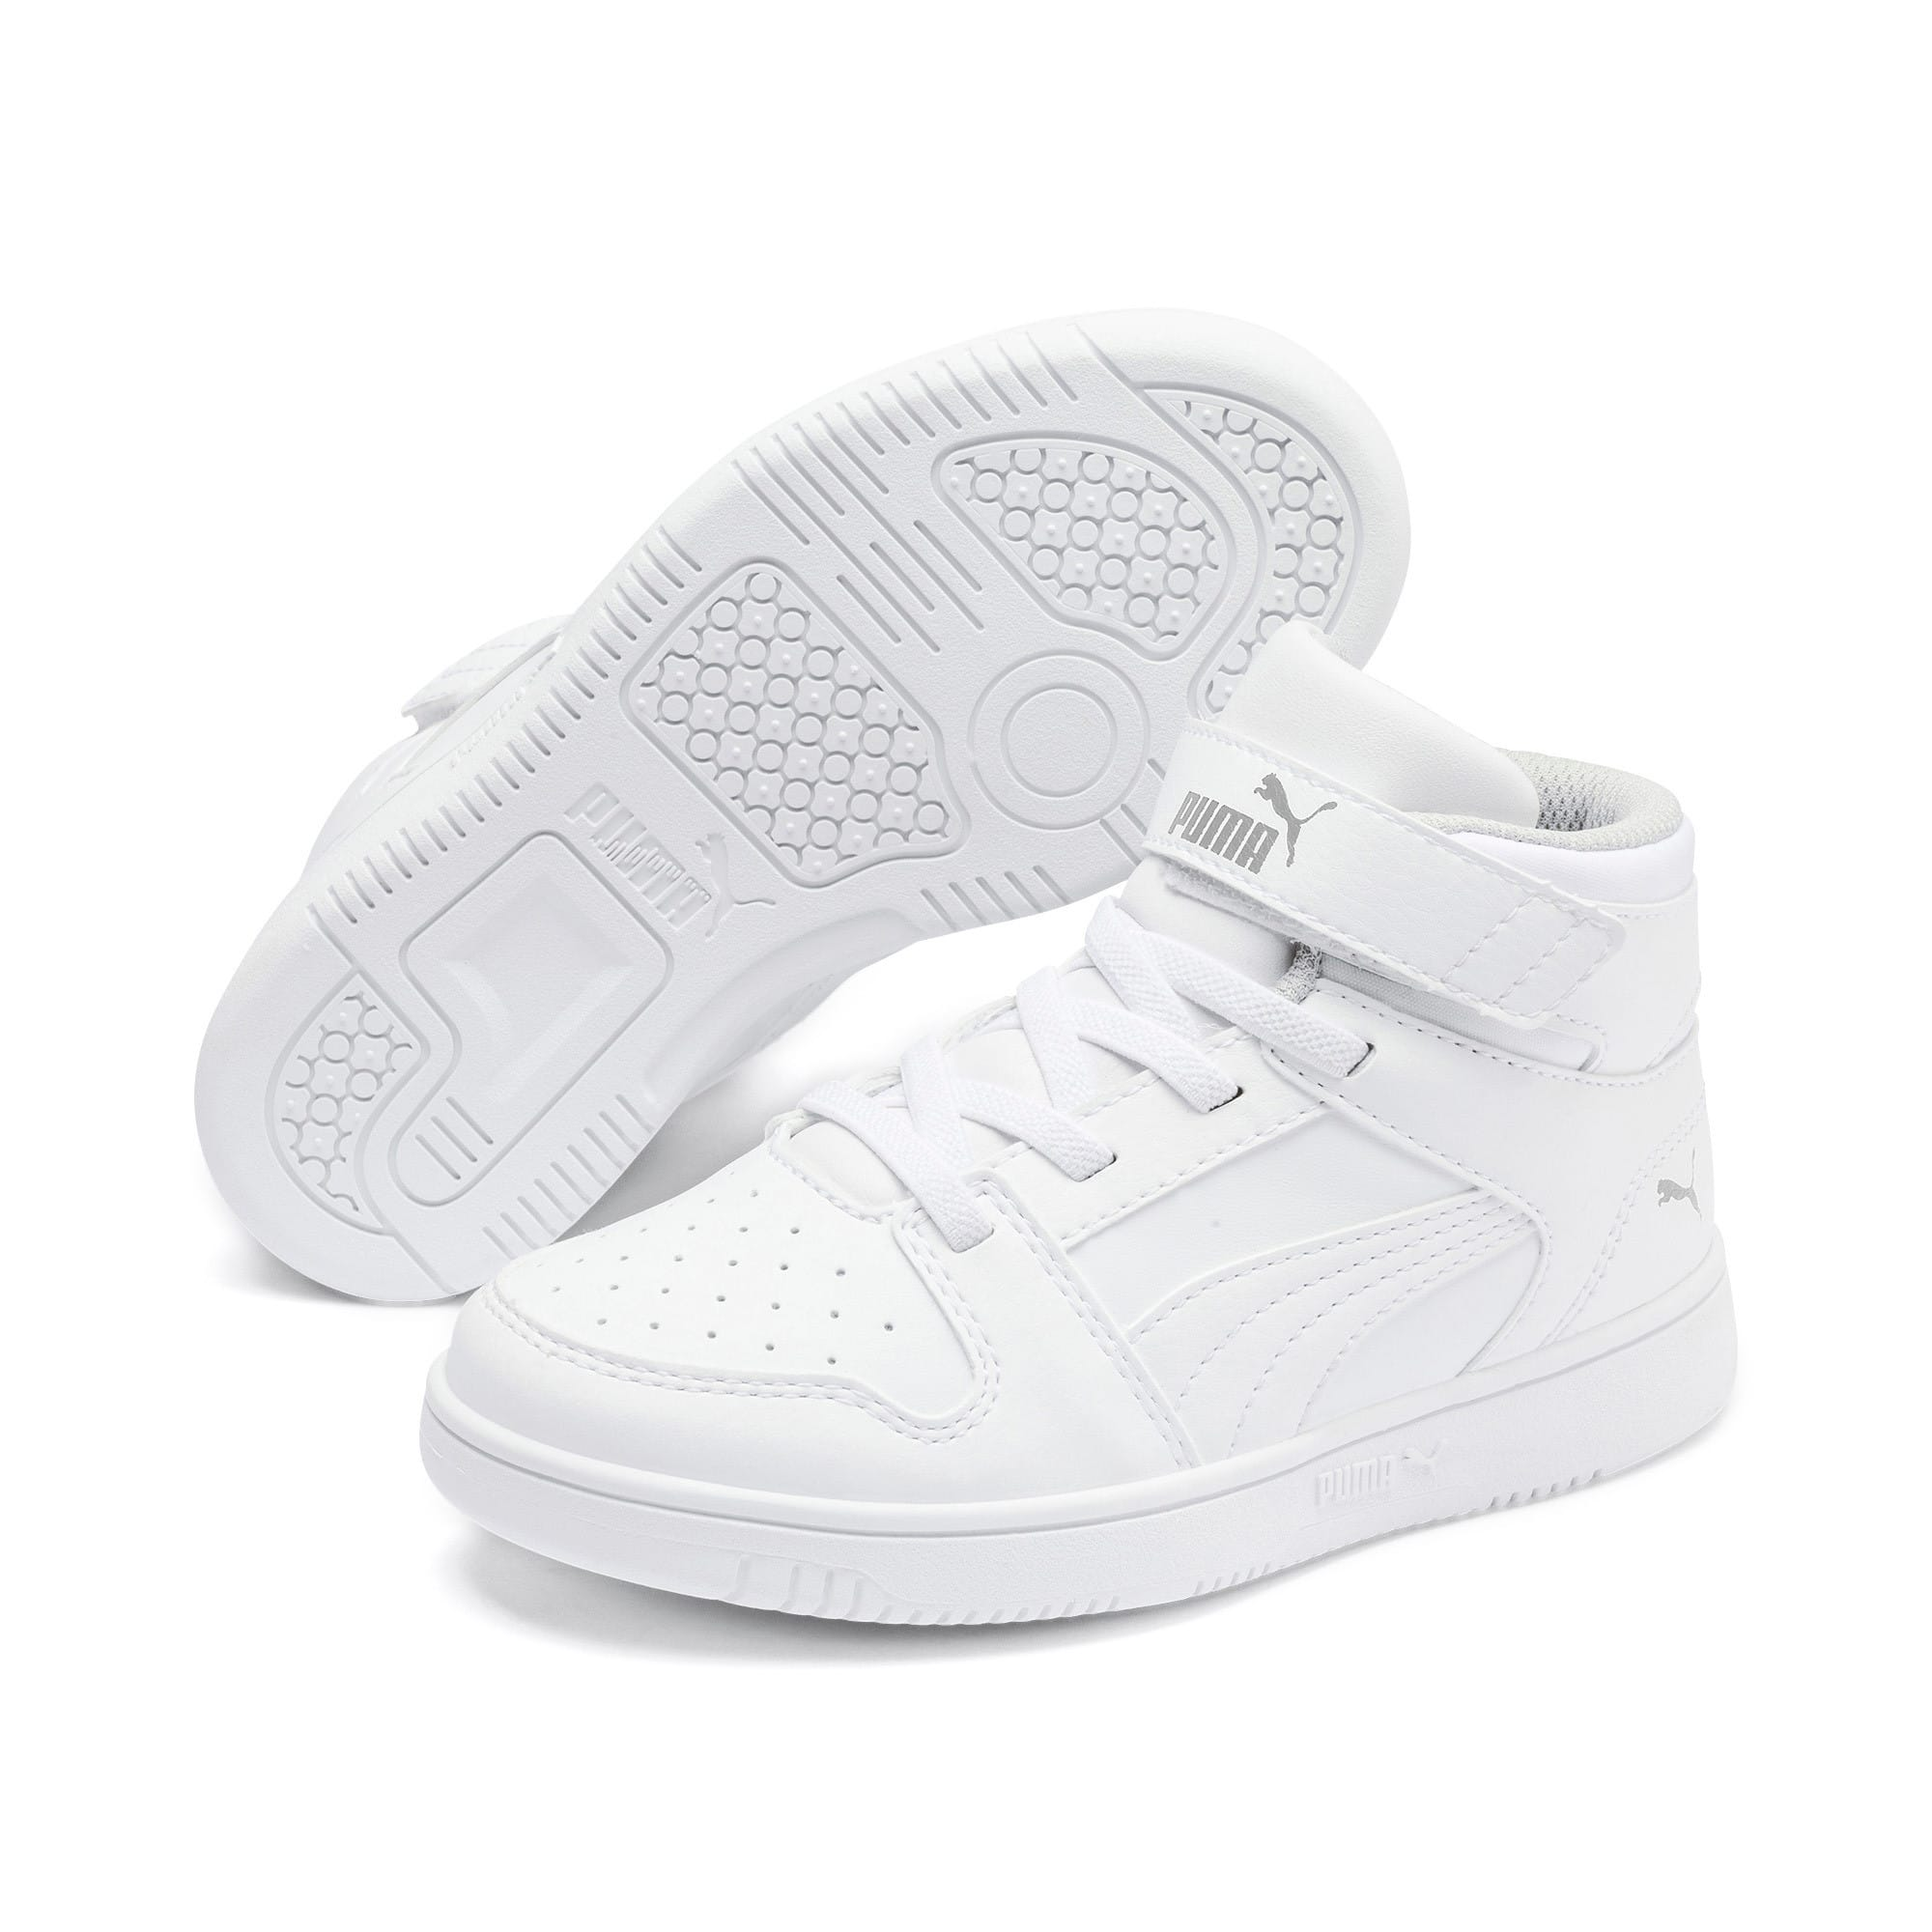 Thumbnail 2 of Rebound Lay-Up SL V Kids Sneaker, Puma White-Gray Violet, medium